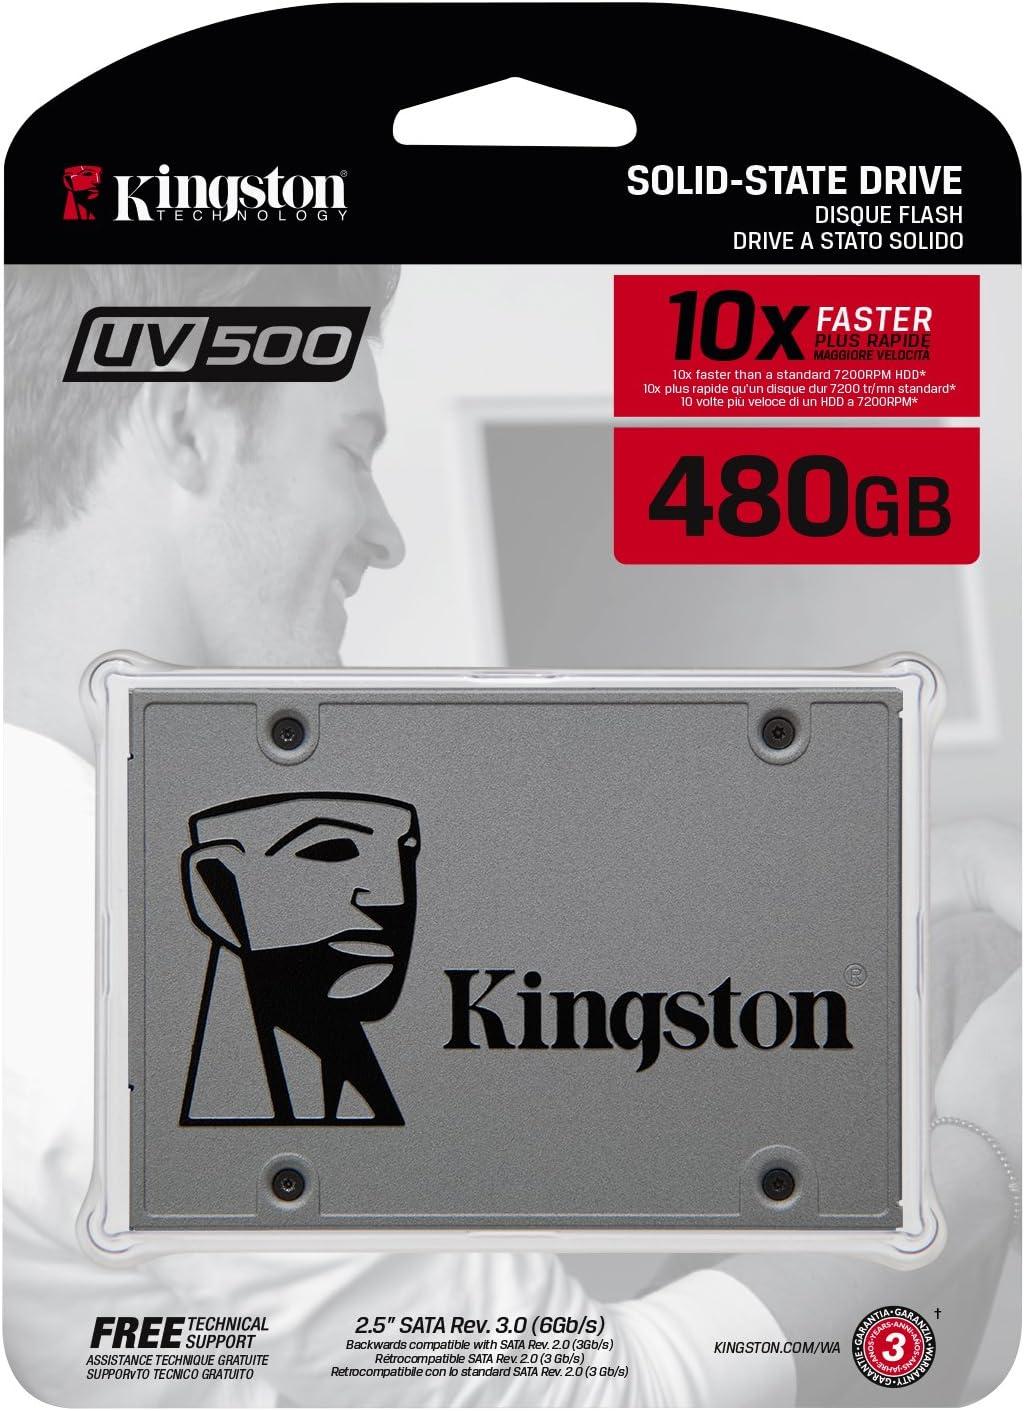 Kingston SUV500/480G - Unidad de Disco Duro SSD, 480 GB, SATA3, 2.5